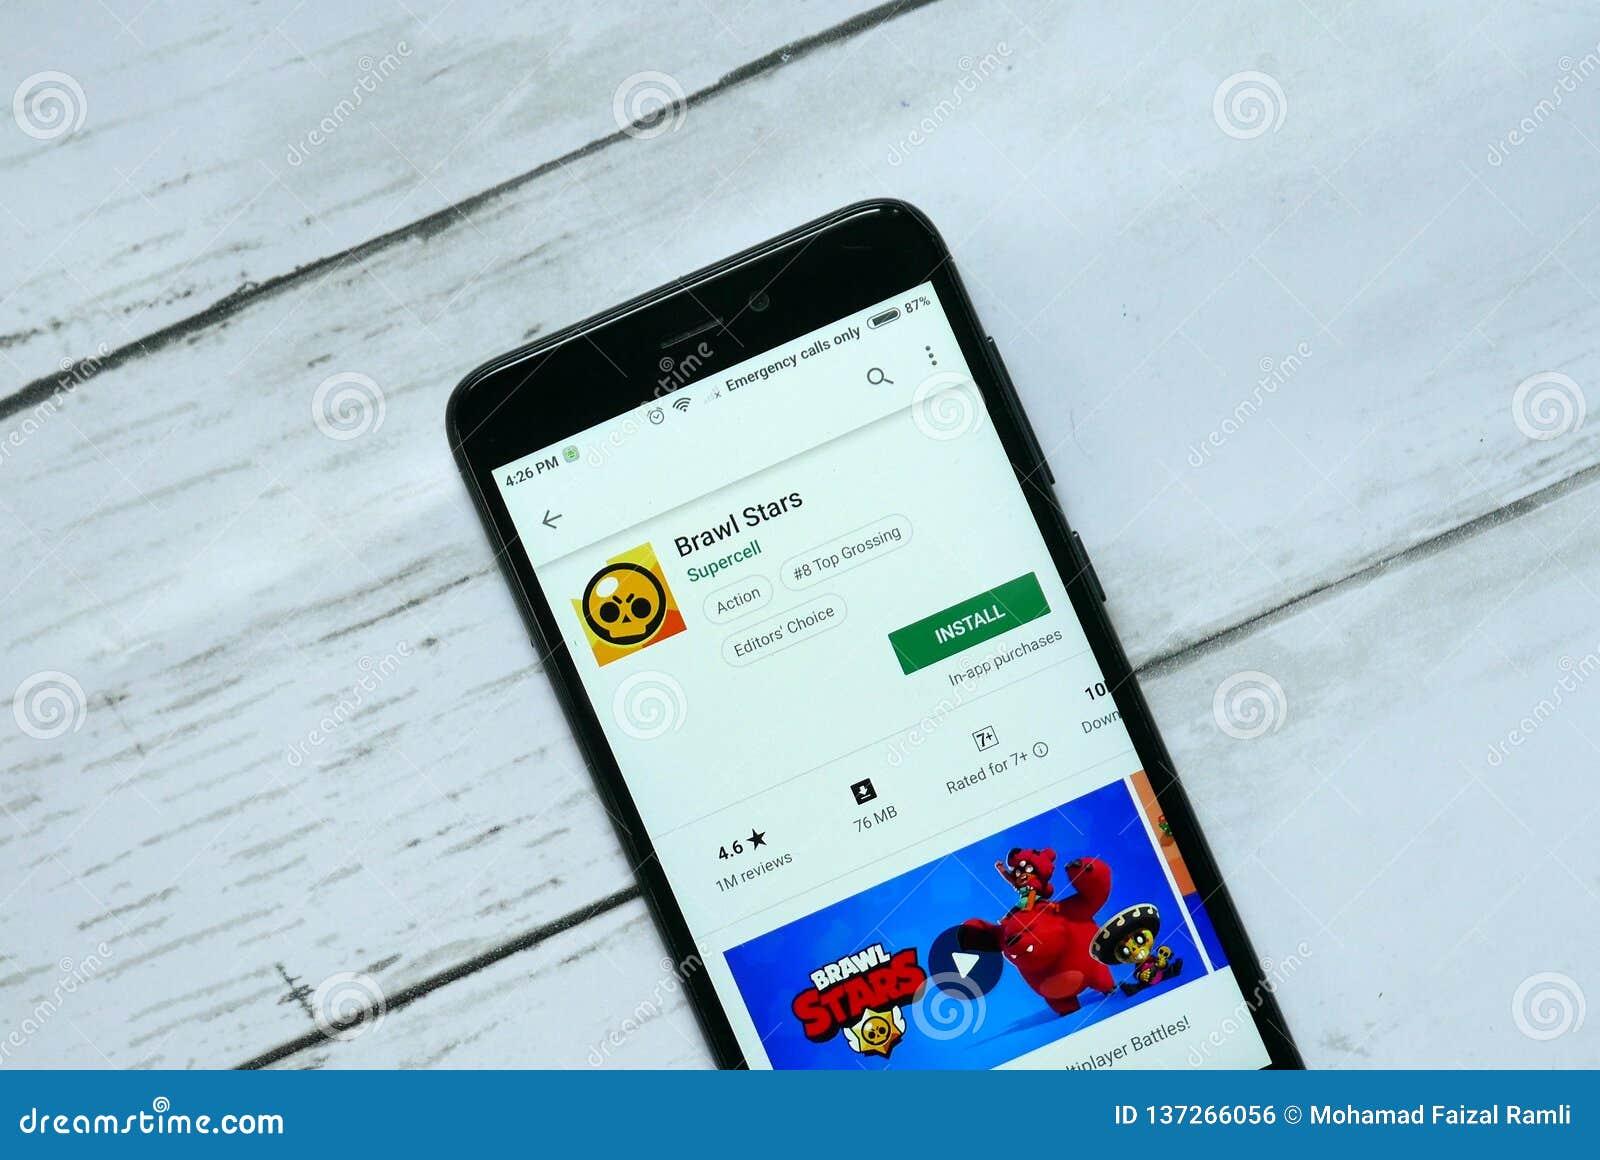 BANDAR SERI BEGAWAN, BRUNEI - 21. JANUAR 2019: Lärm-Sternanwendung auf einem androiden Google Play Store